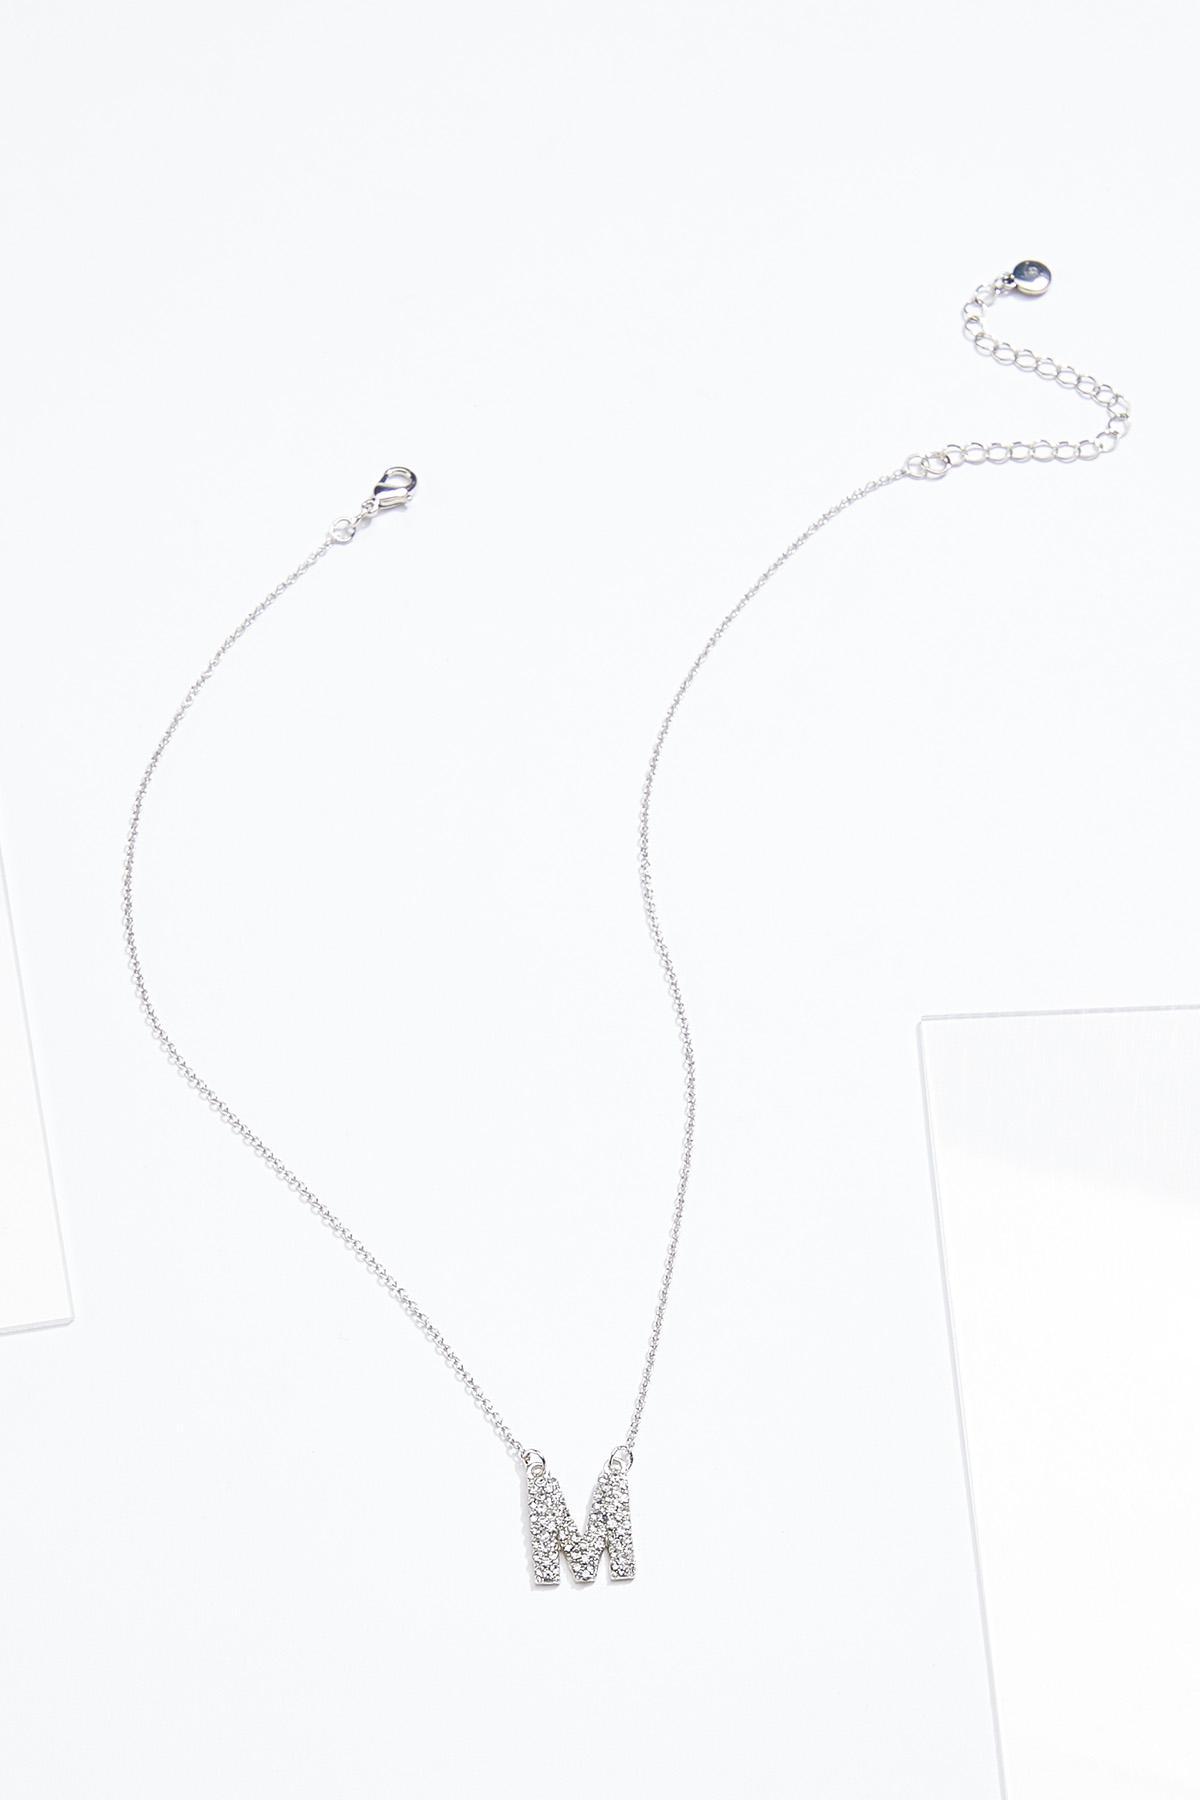 Rhinestone M Pendant Necklace